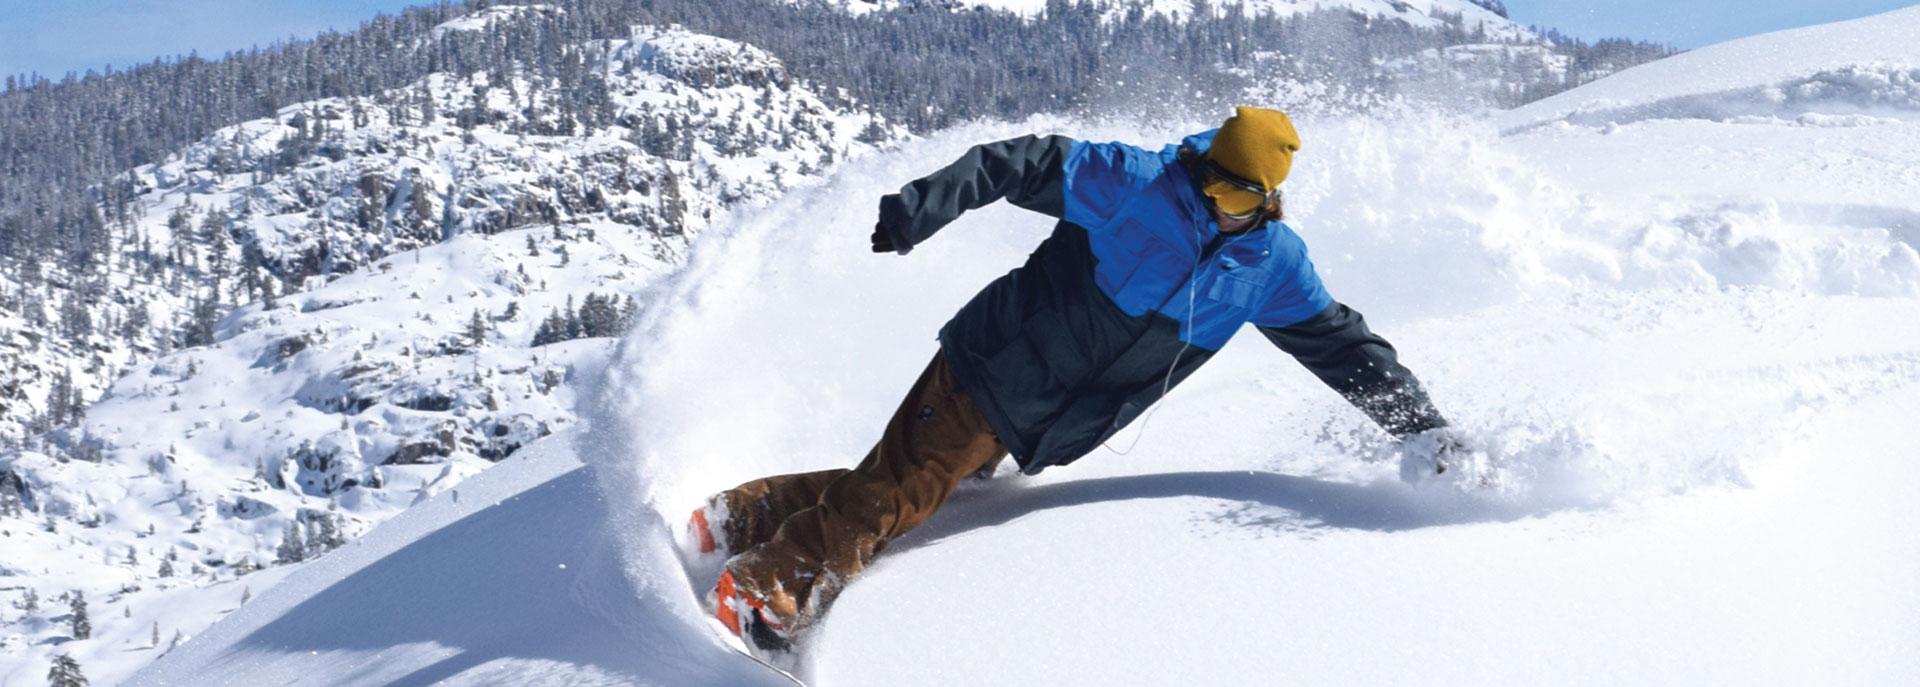 Dodge Ridge Ski Area closest California Snow to the Bay Area